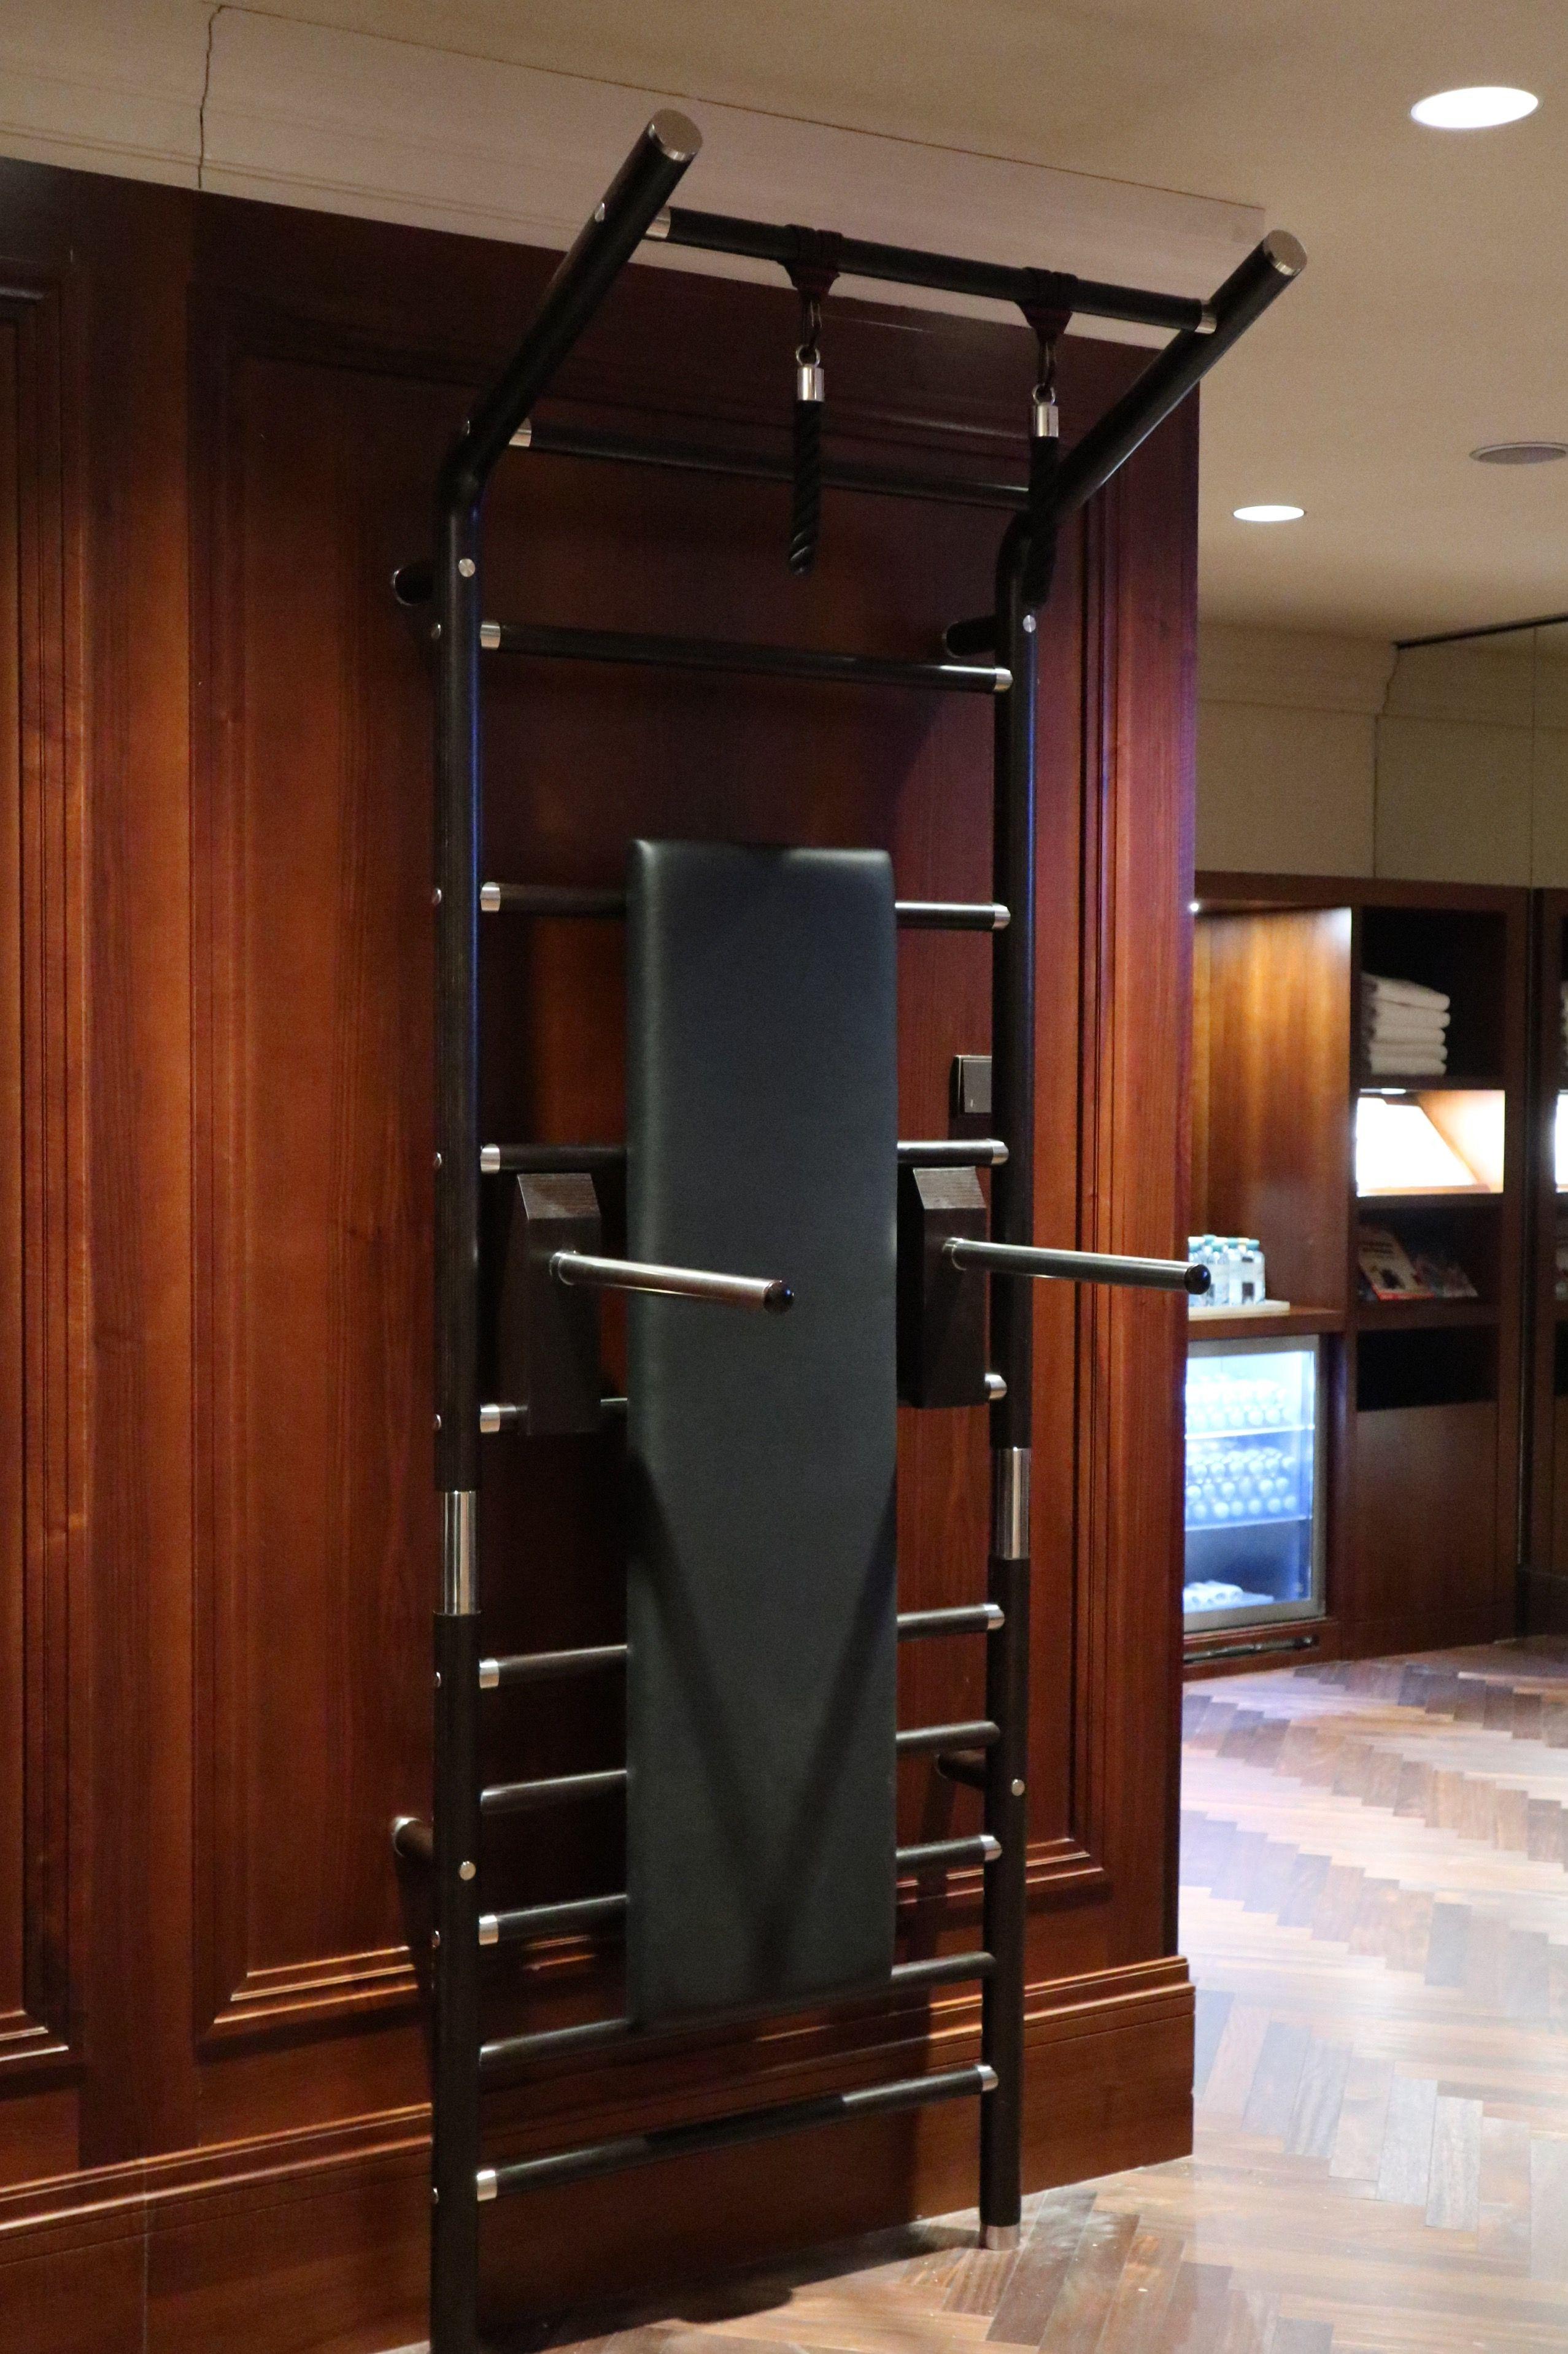 Luxus/Design Sprossenwand maxwall Design homegym Holz